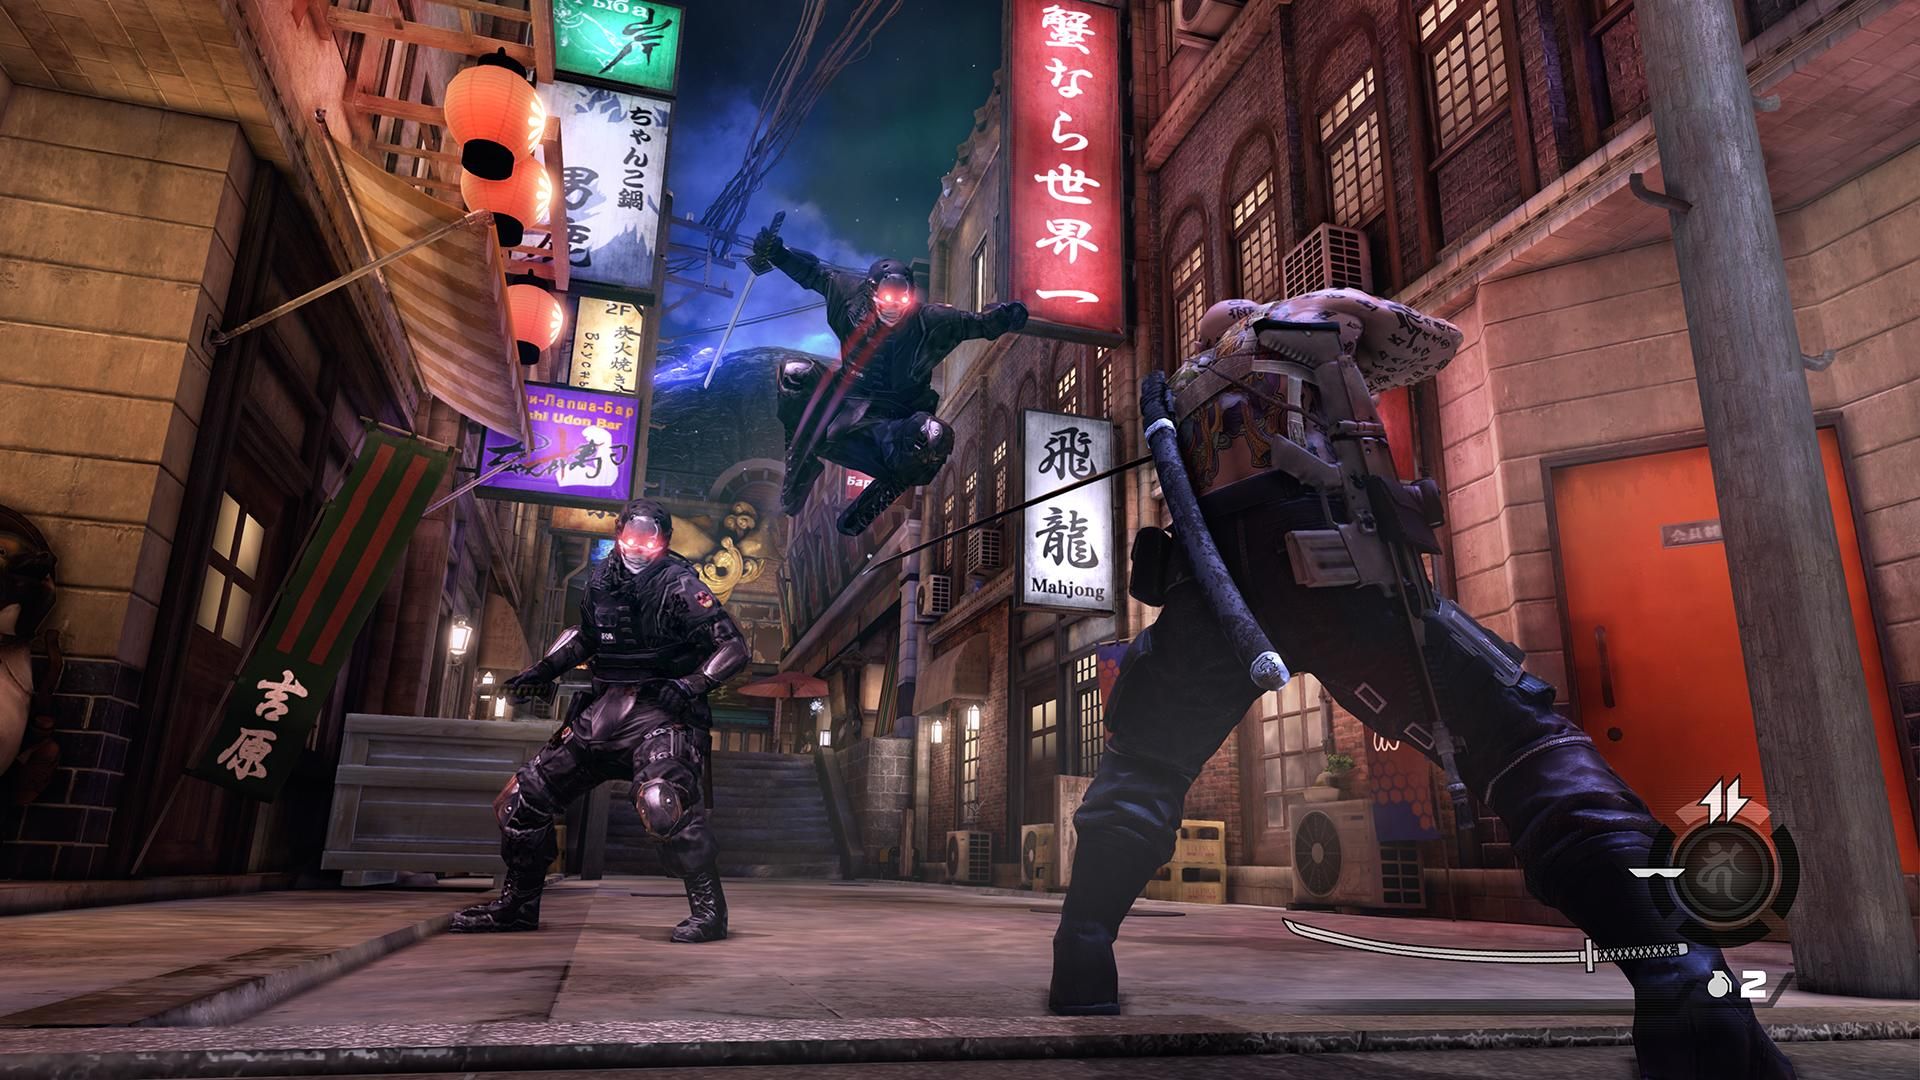 Amazon.com: Devils Third - Wii U [Digital Code]: Video Games